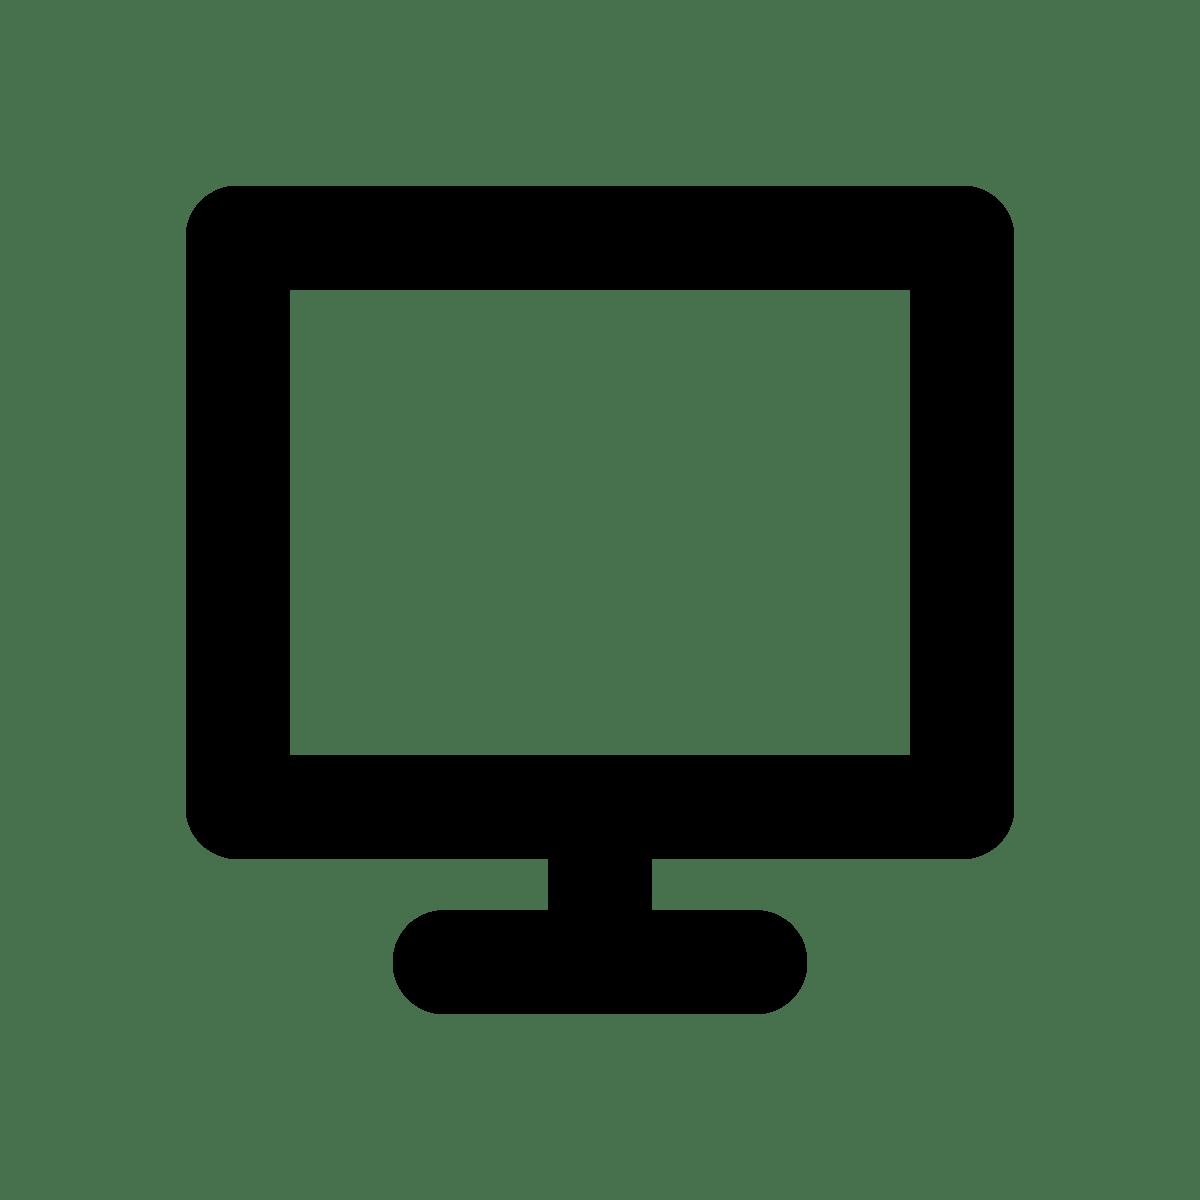 EMC screen icon